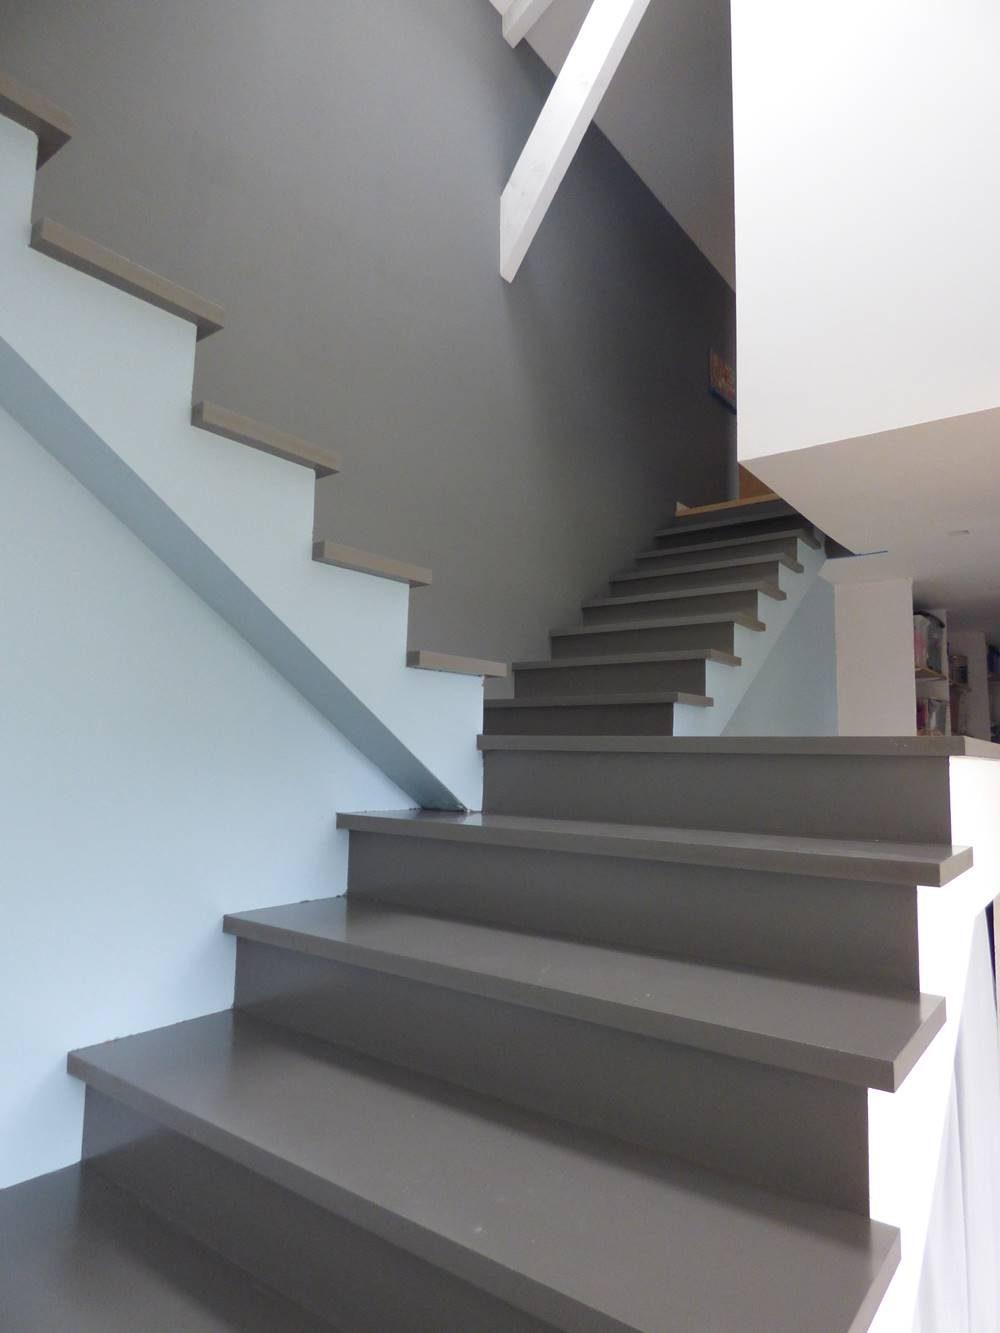 escalier menuiserie peau du cens senand. Black Bedroom Furniture Sets. Home Design Ideas